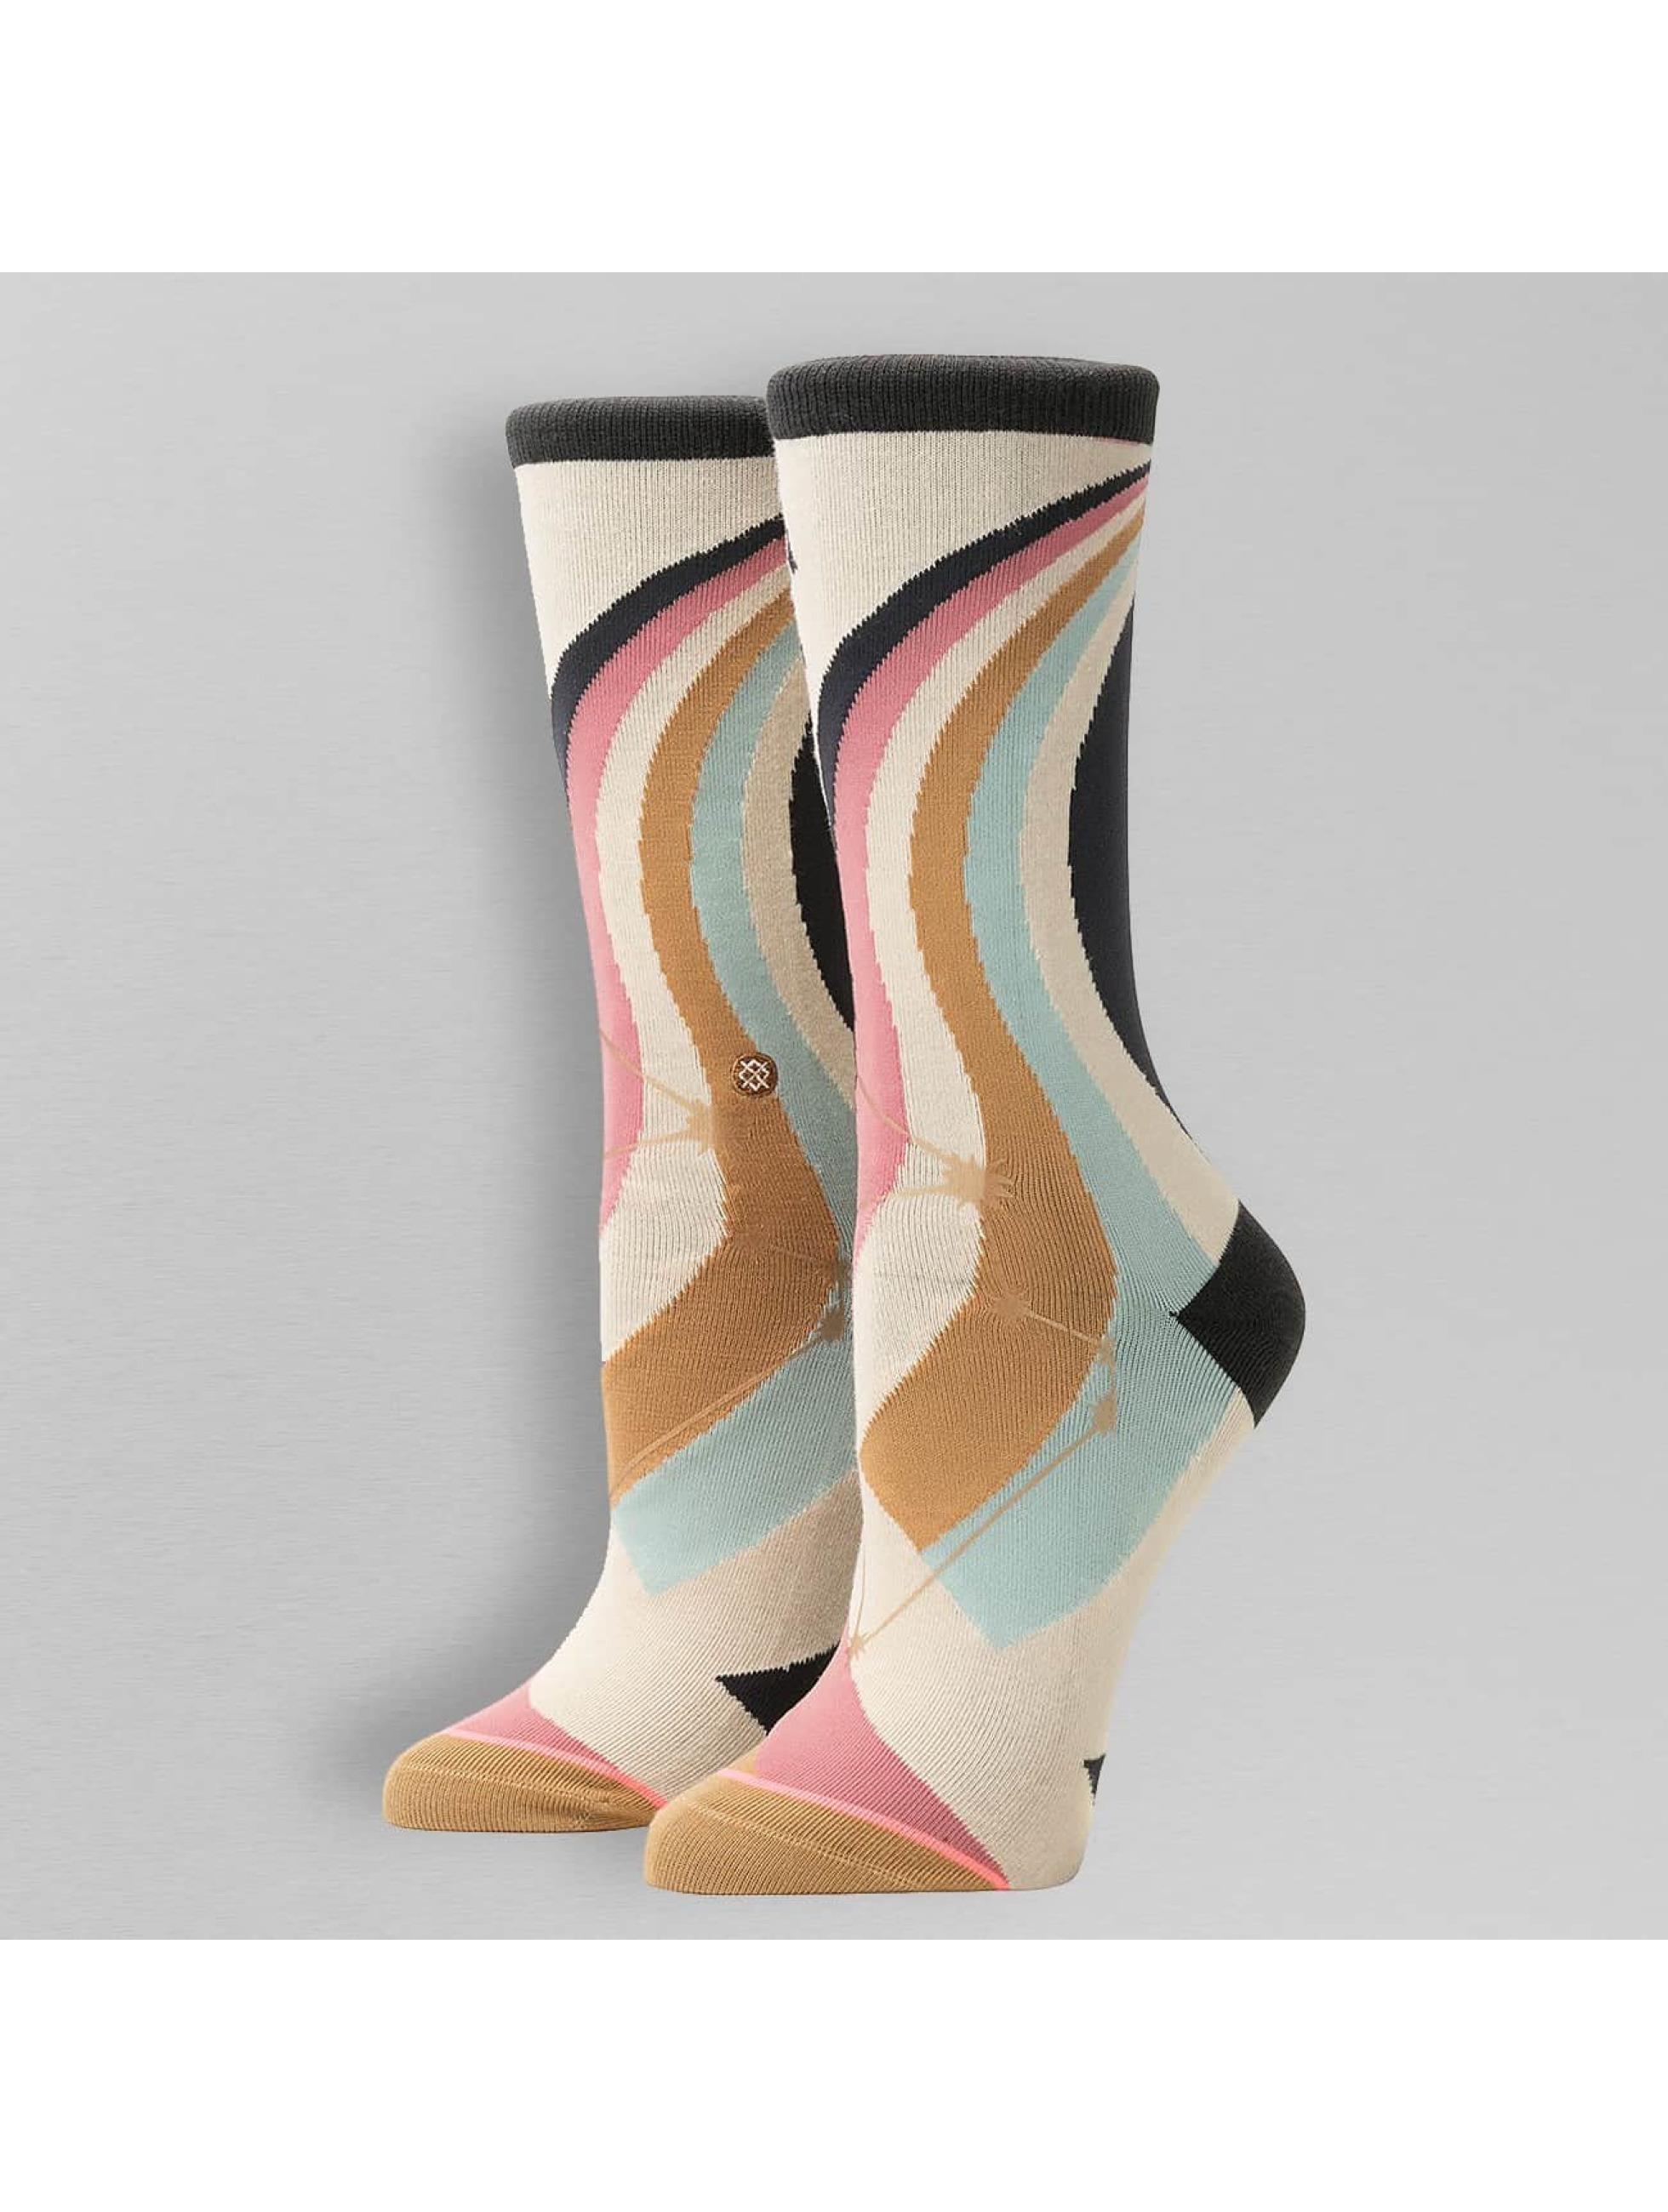 Stance Socks Aquarius Zodiac colored